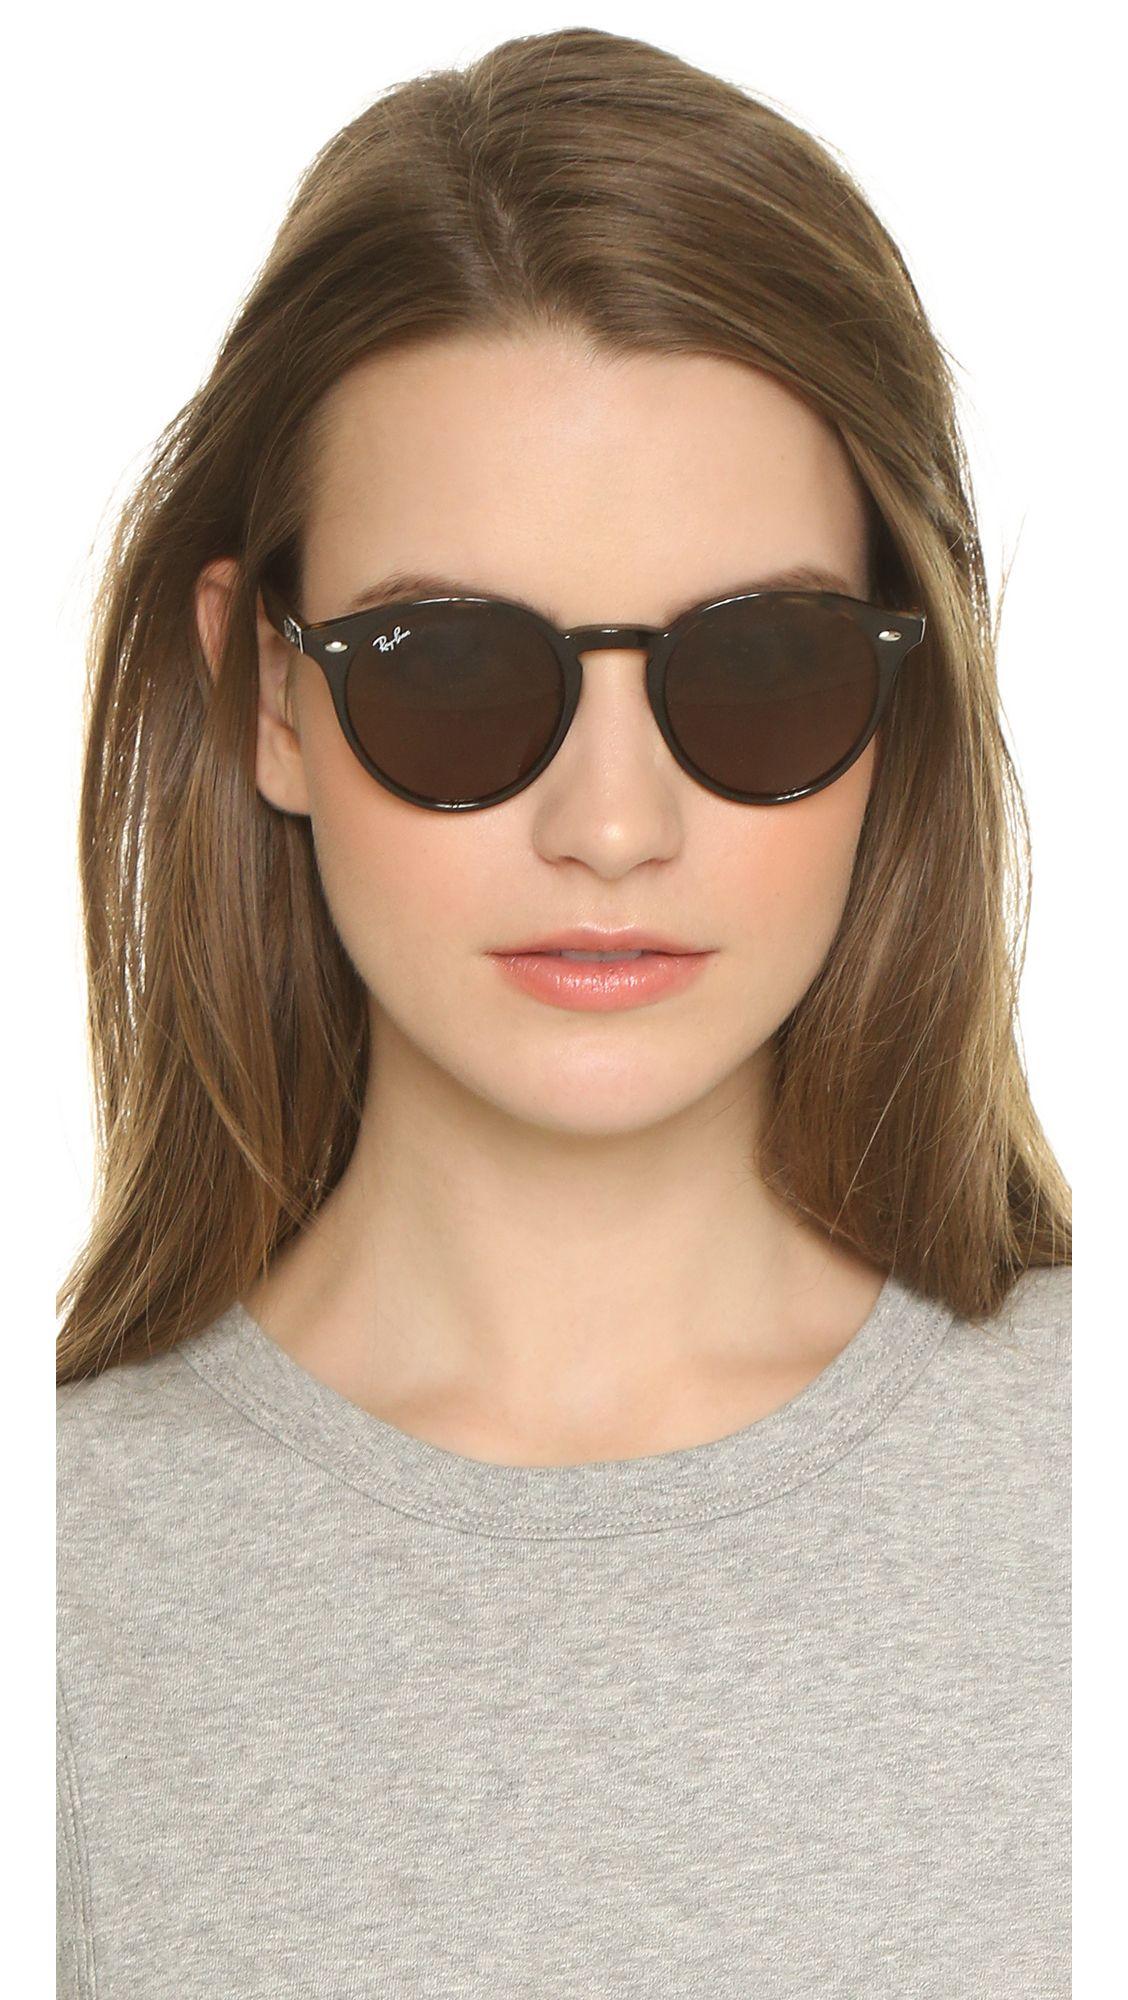 3297396ce0 Ray-Ban Highstreet Round Sunglasses